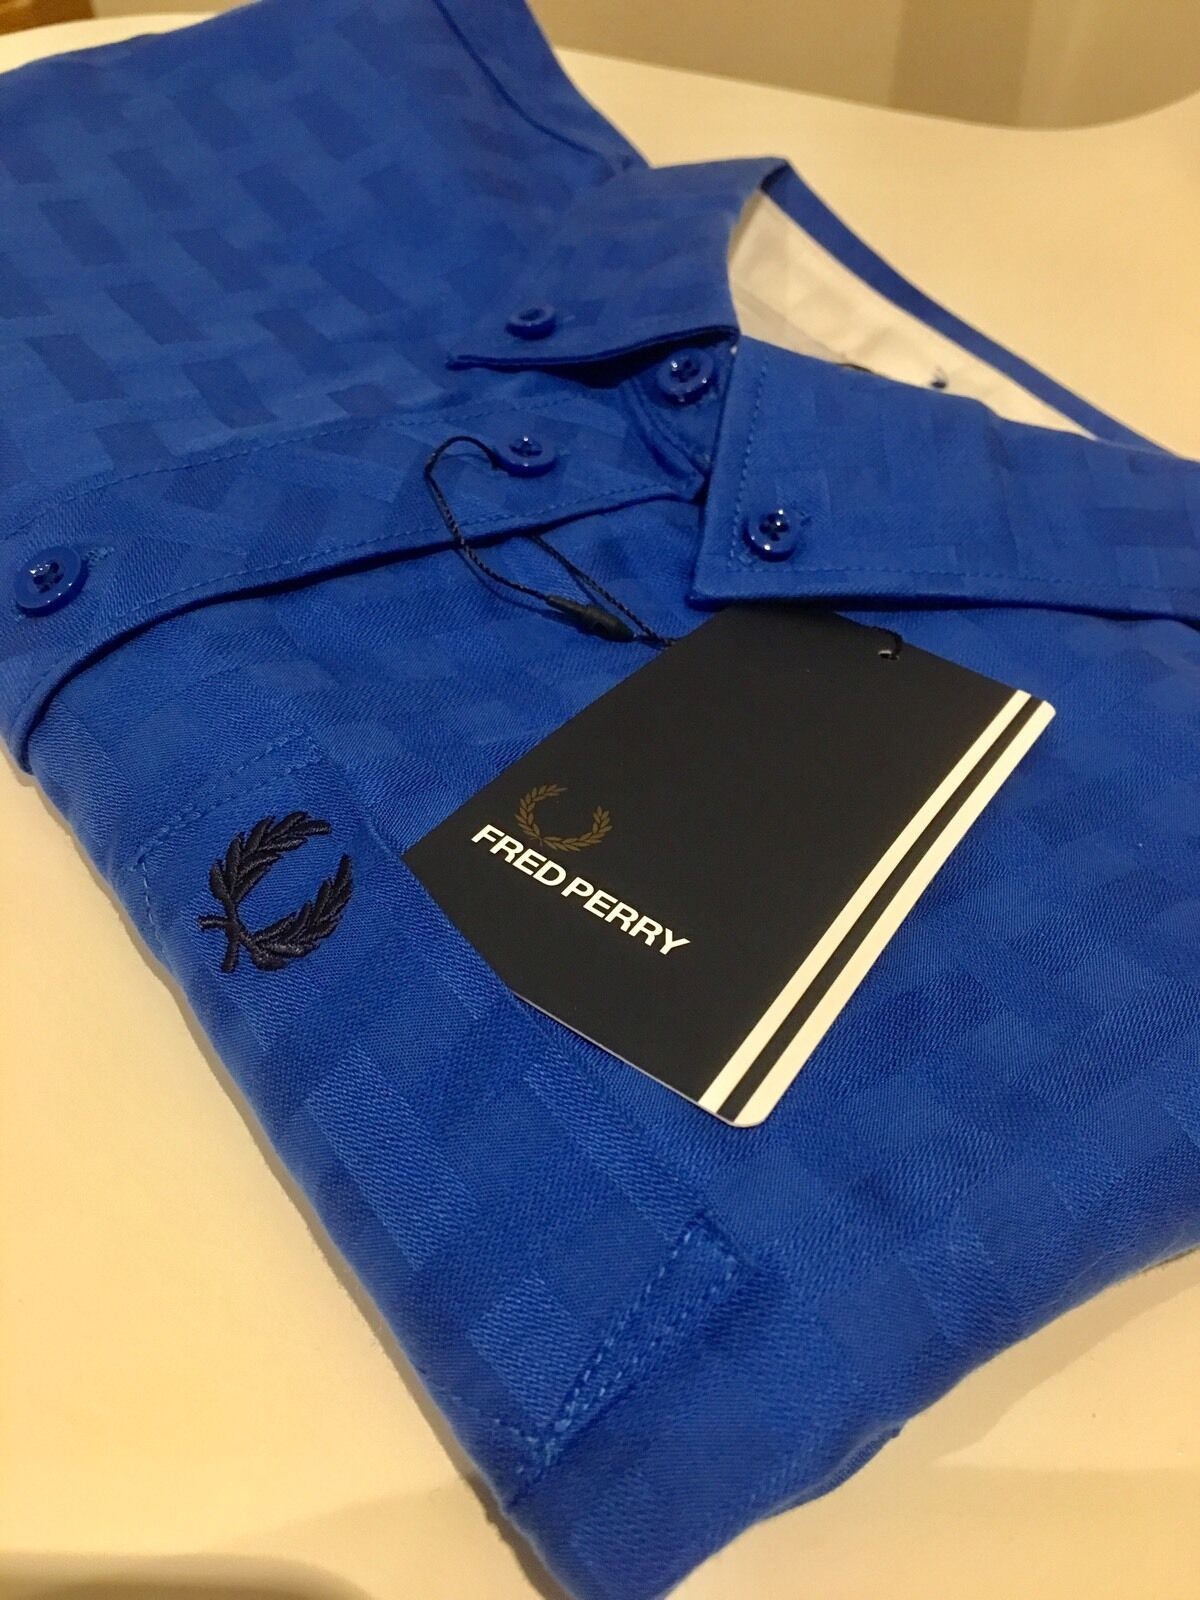 Frot PERRY ladies Refresher Blau shirt Größe 6